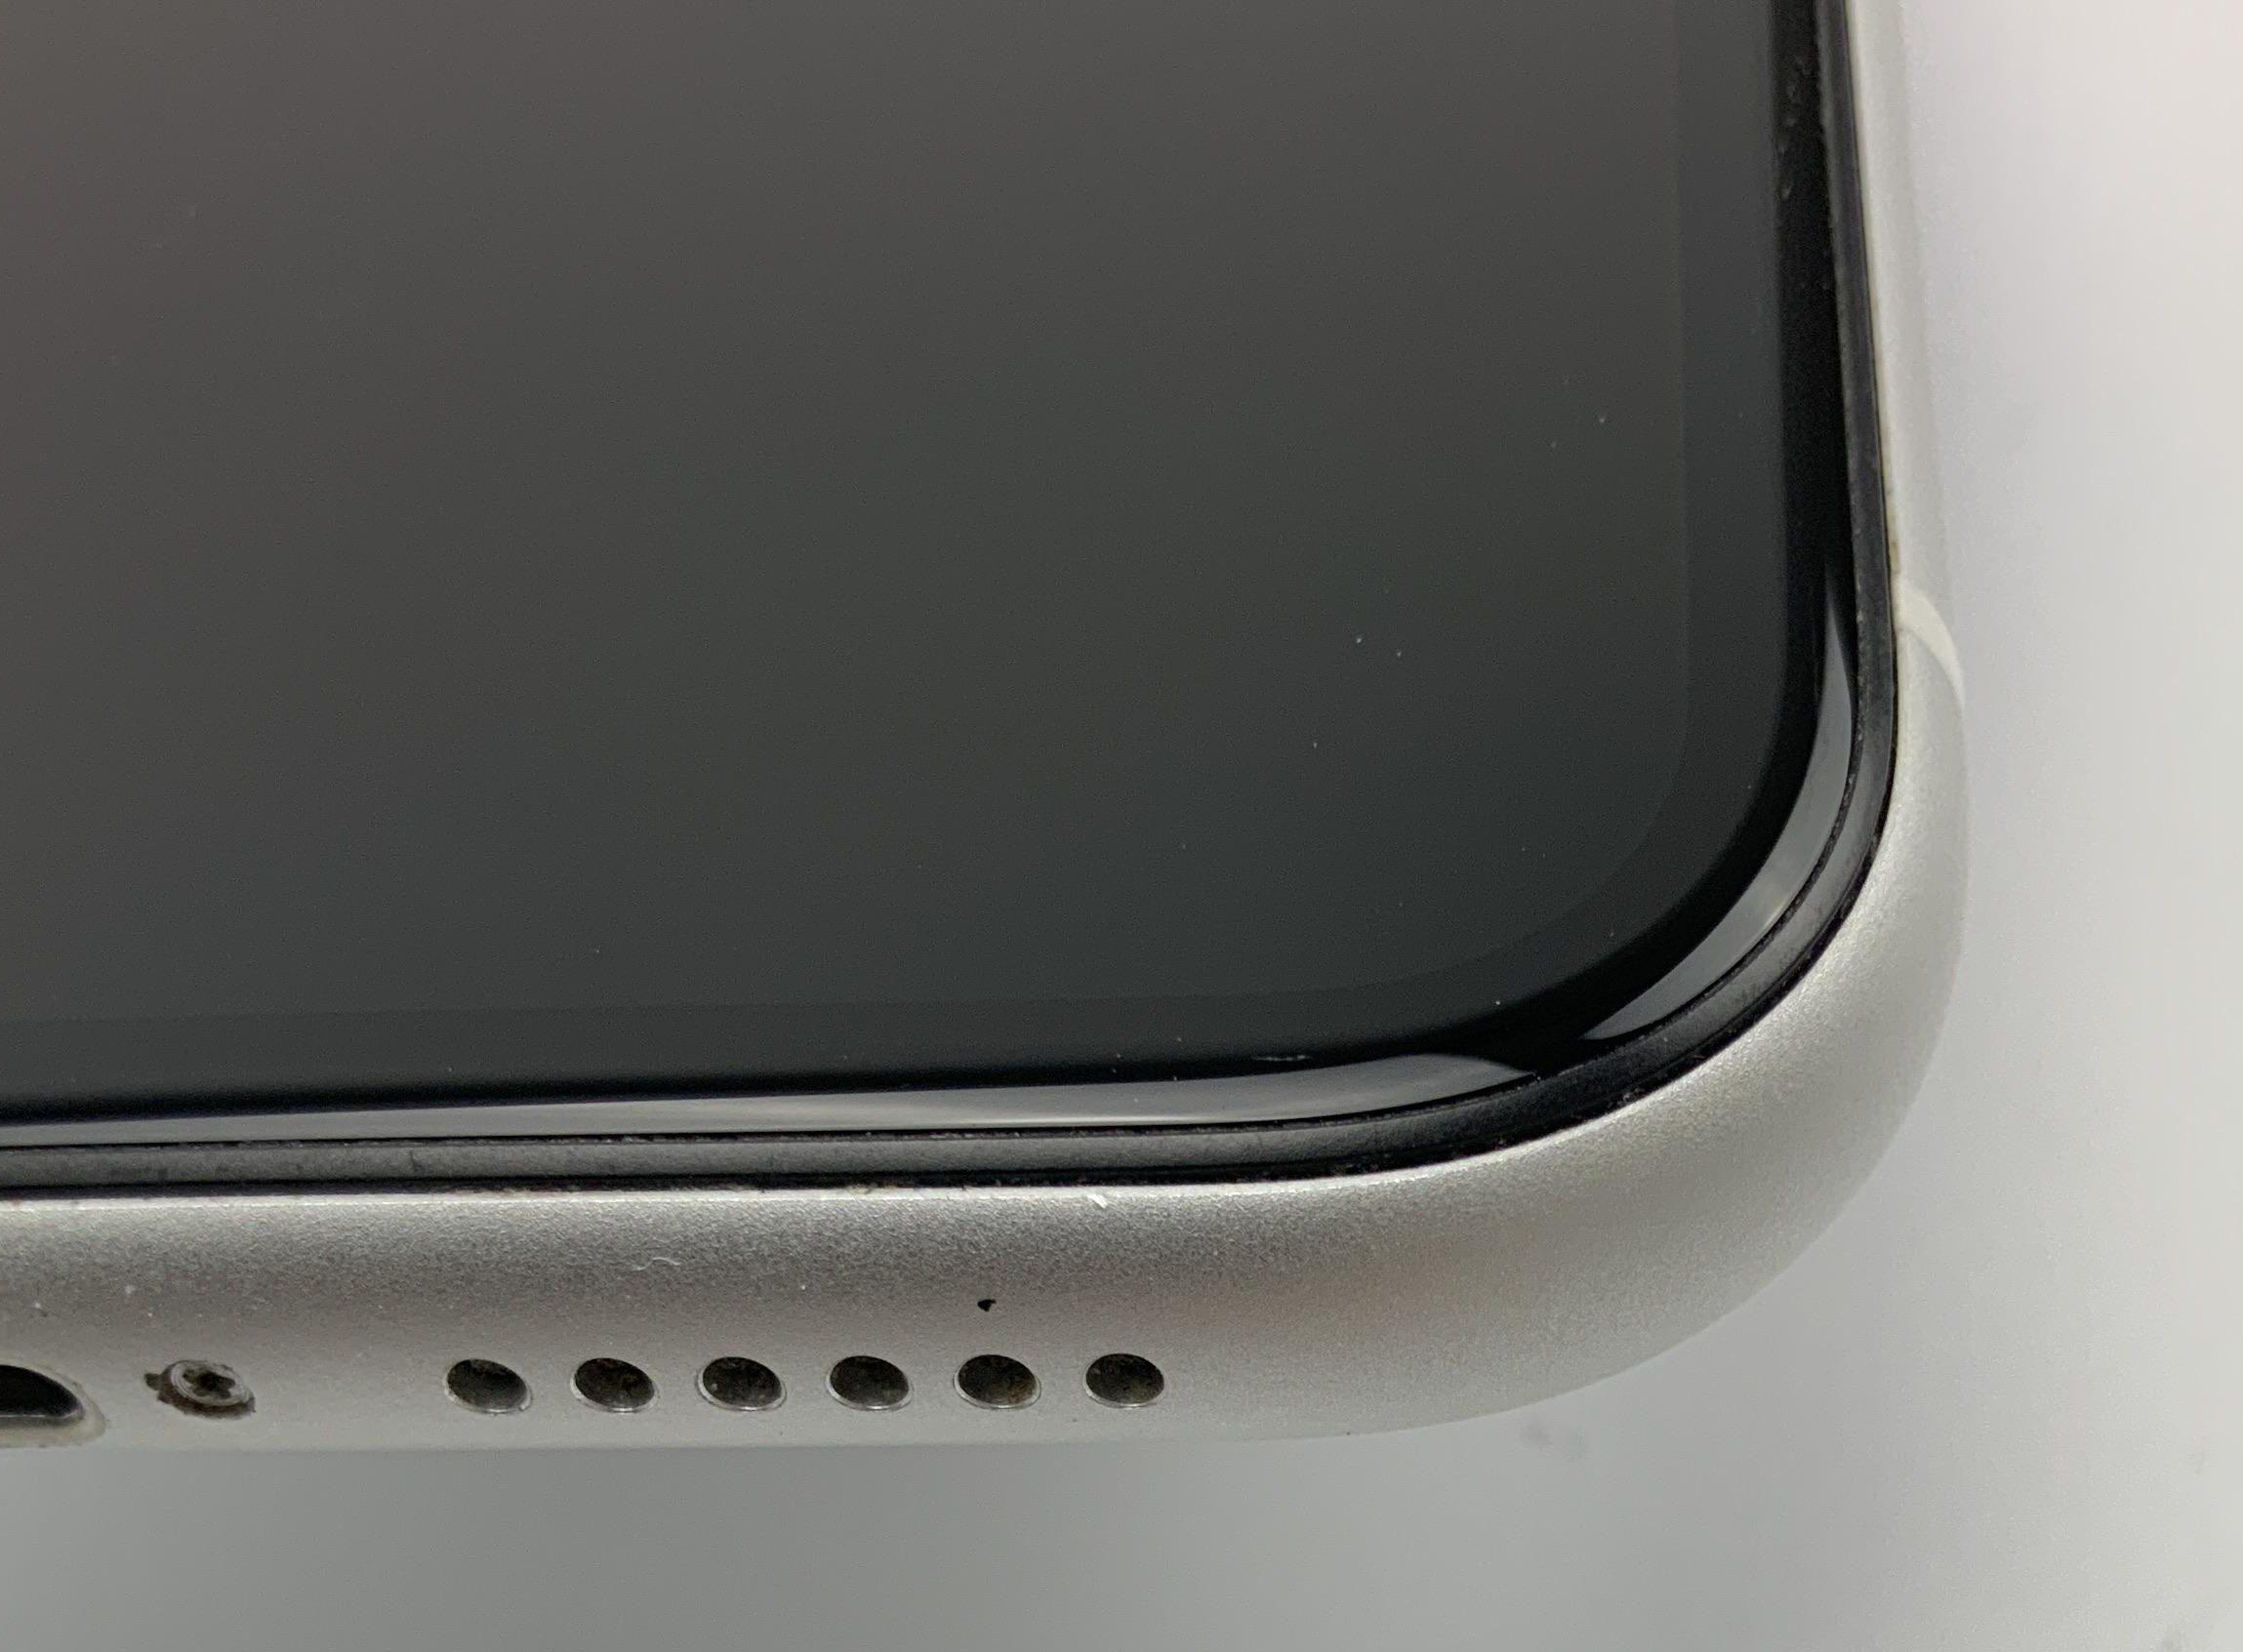 iPhone XR 64GB, 64GB, White, image 3